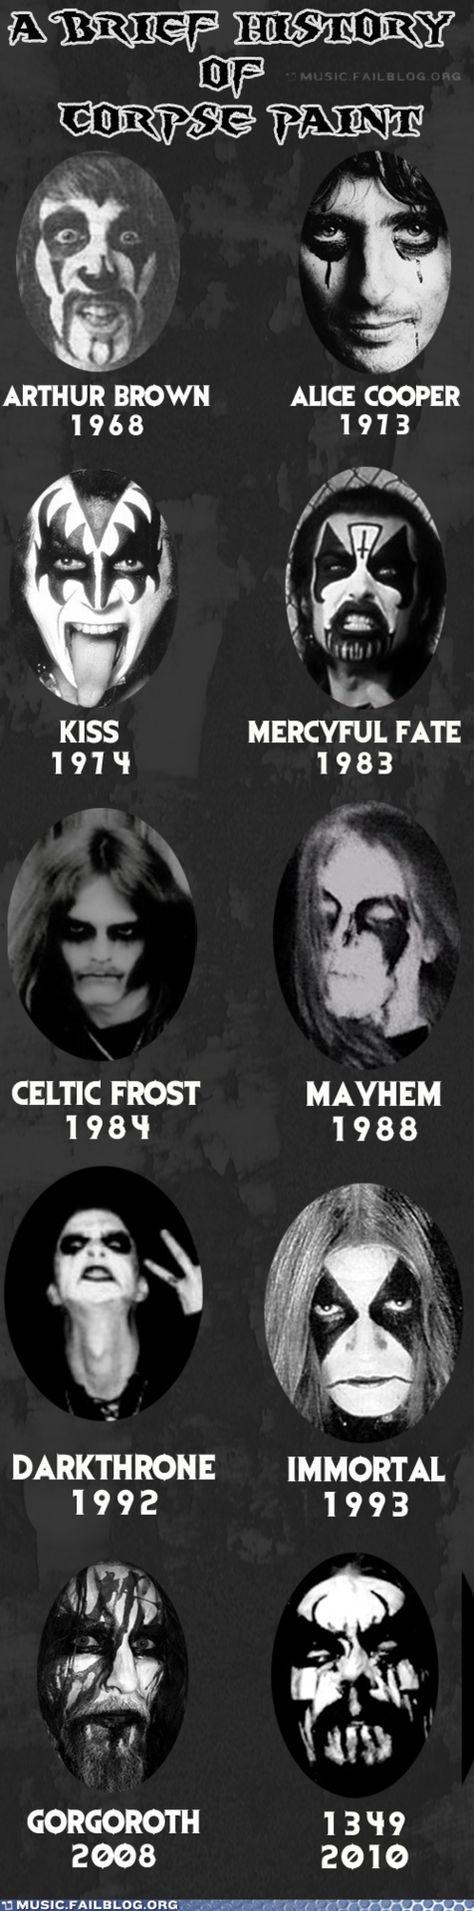 A brief history of corpse paint:   Arthur Brown, Alice Cooper, KISS, Mercyful Fate, Celtic Frost, Mayhem, Darktrhone, Immortal, Gorgoroth, 1349